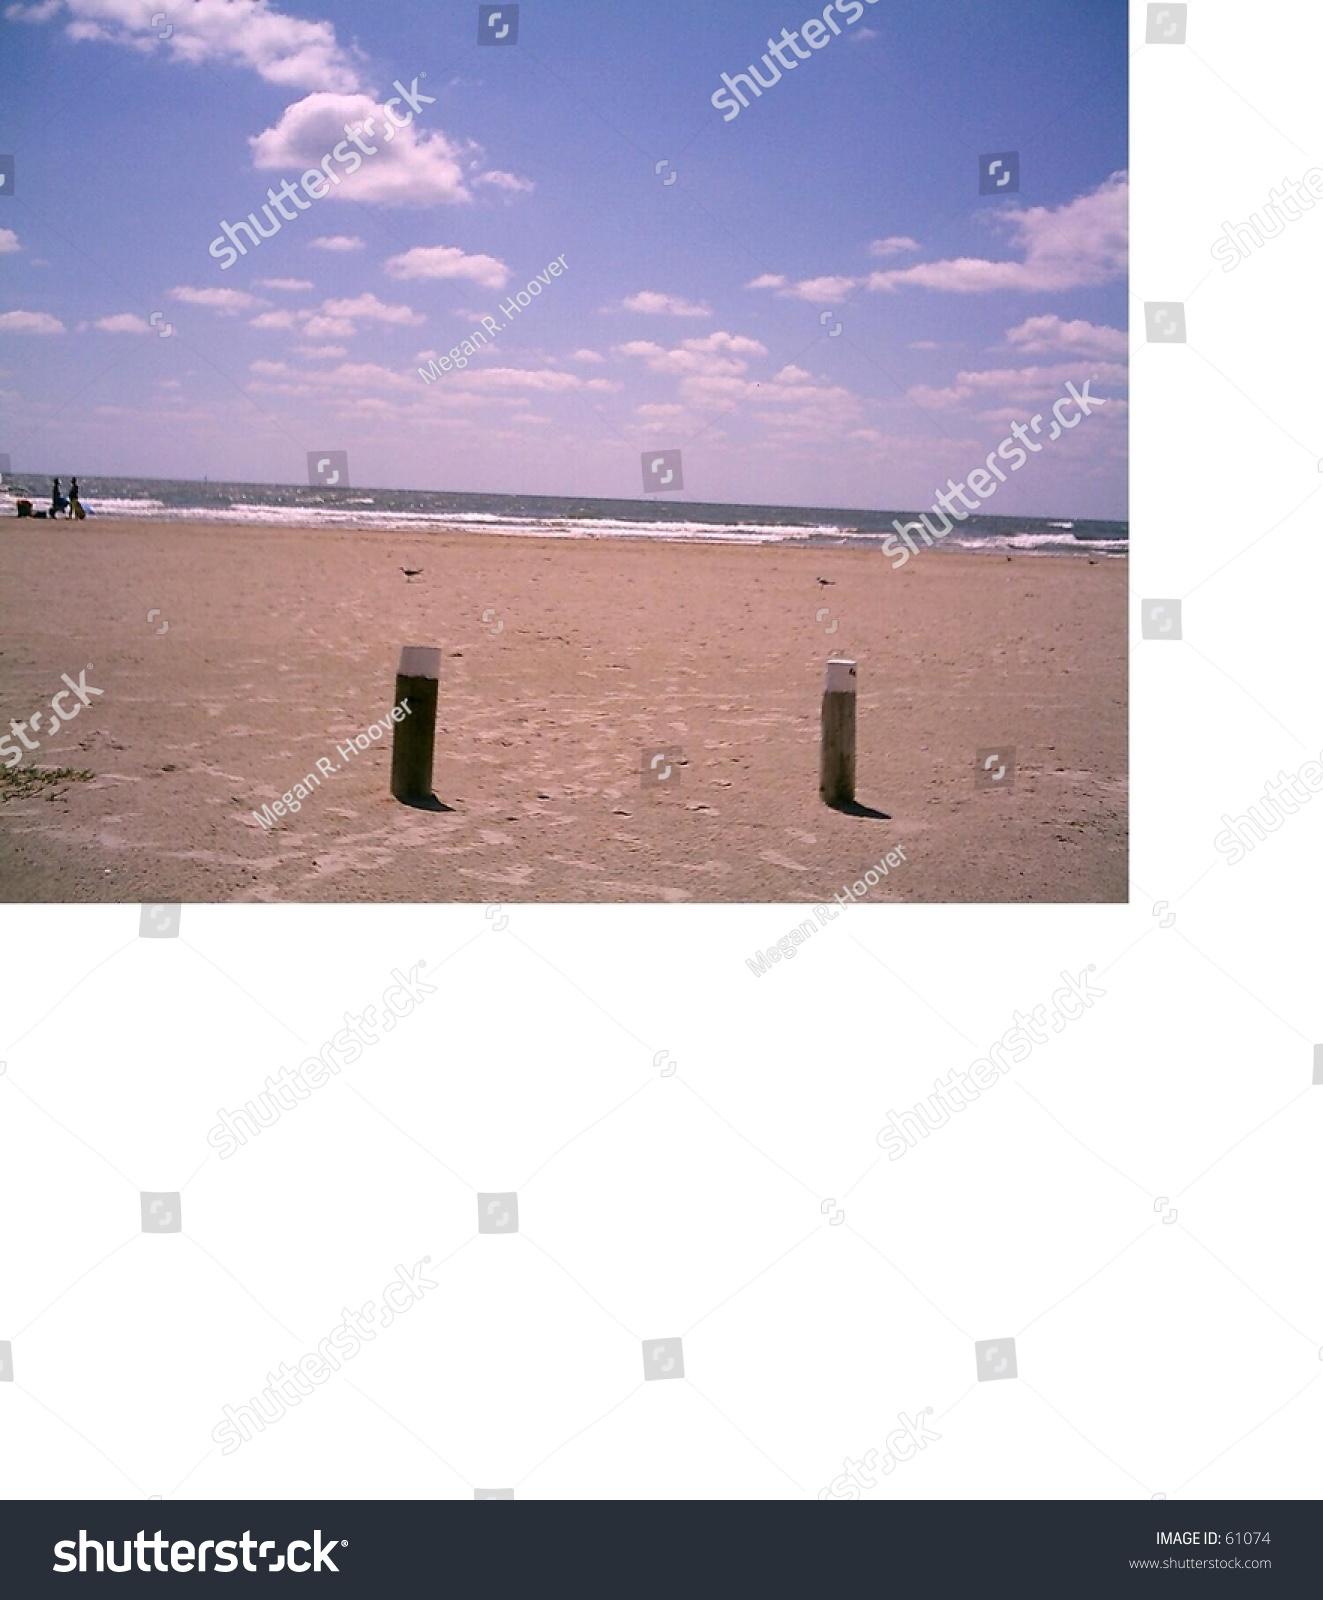 Mustang Island Beach: Photo Taken On Beach On Mustang Island In Corpus Christi